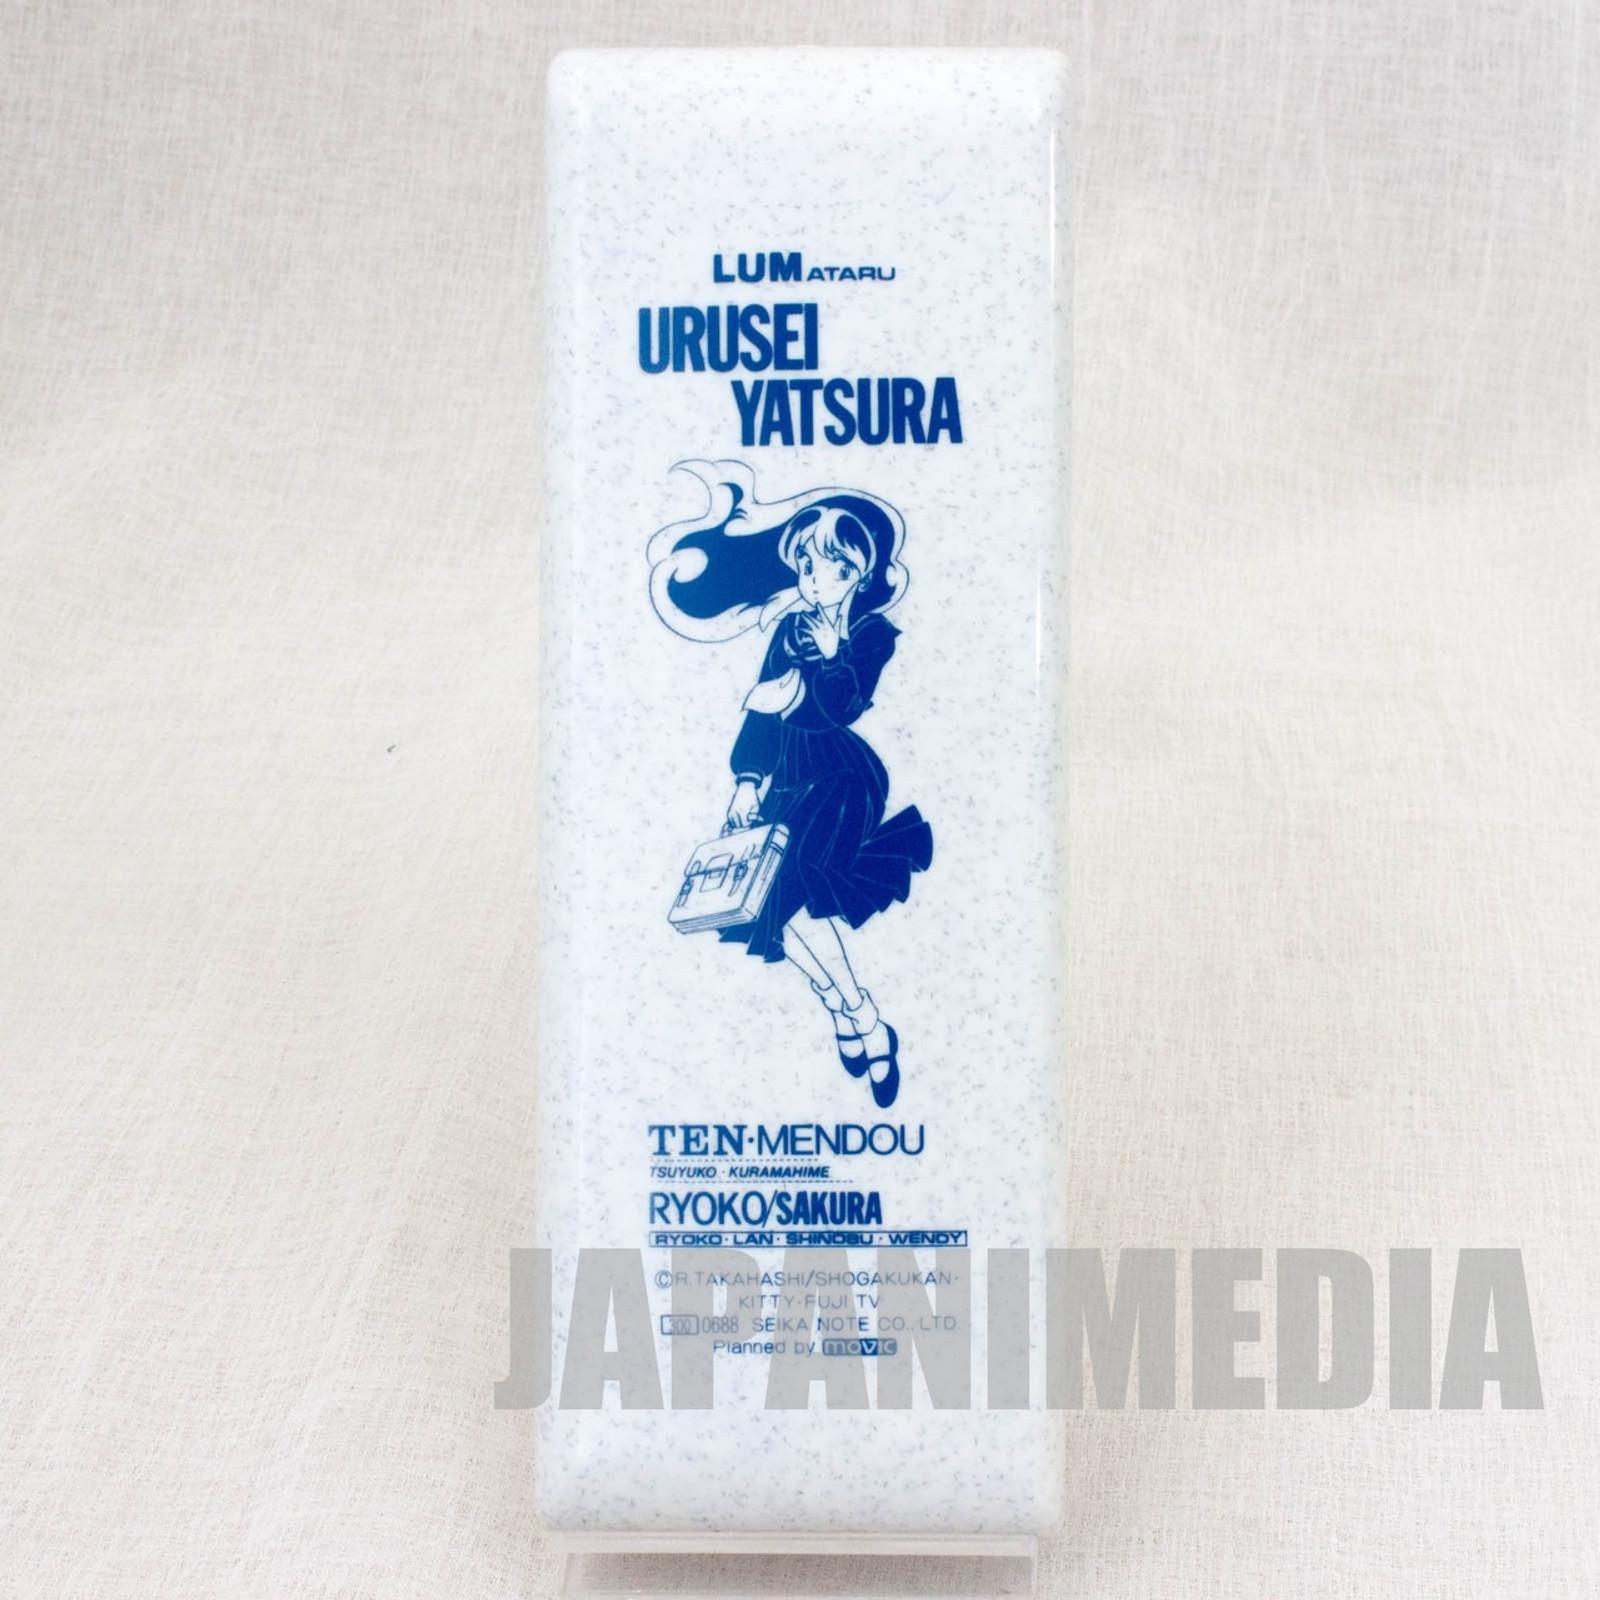 Retro RARE Urusei Yatsura LUM Plastic Pen Case JAPAN ANIME MANGA